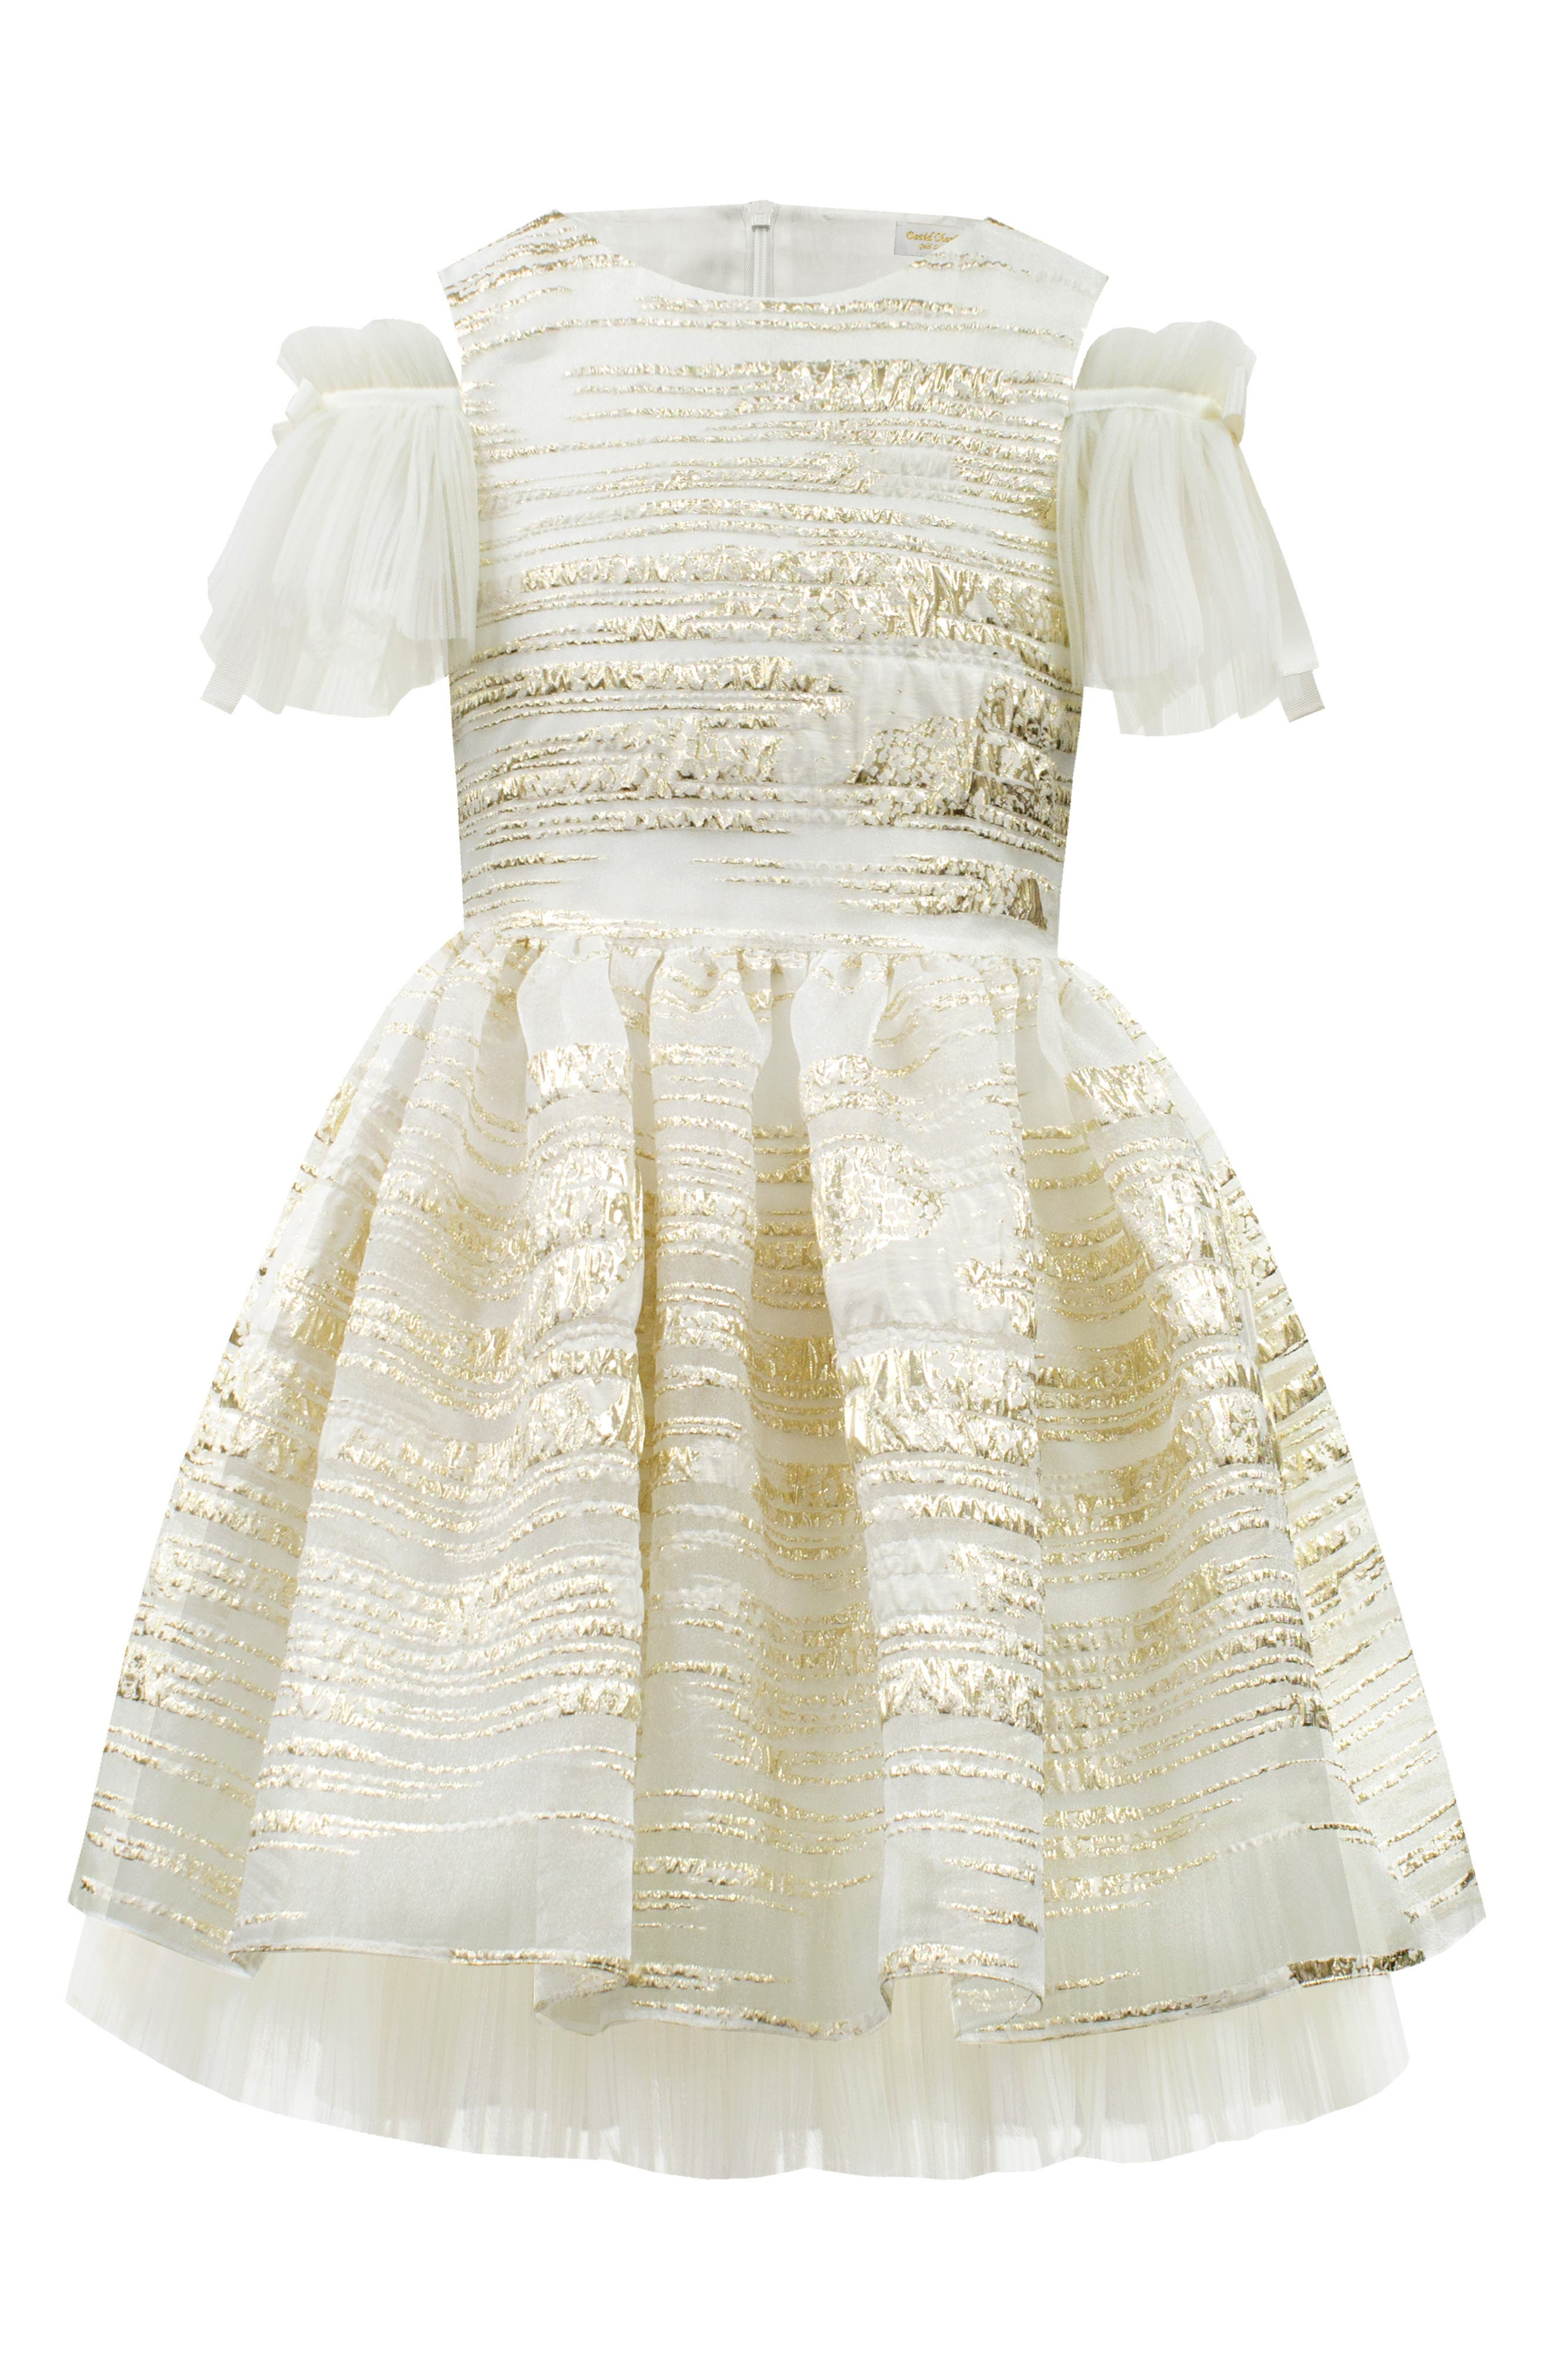 Girls David Charles Cold Shoulder Metallic Organza Party Dress Size 8Y  Metallic